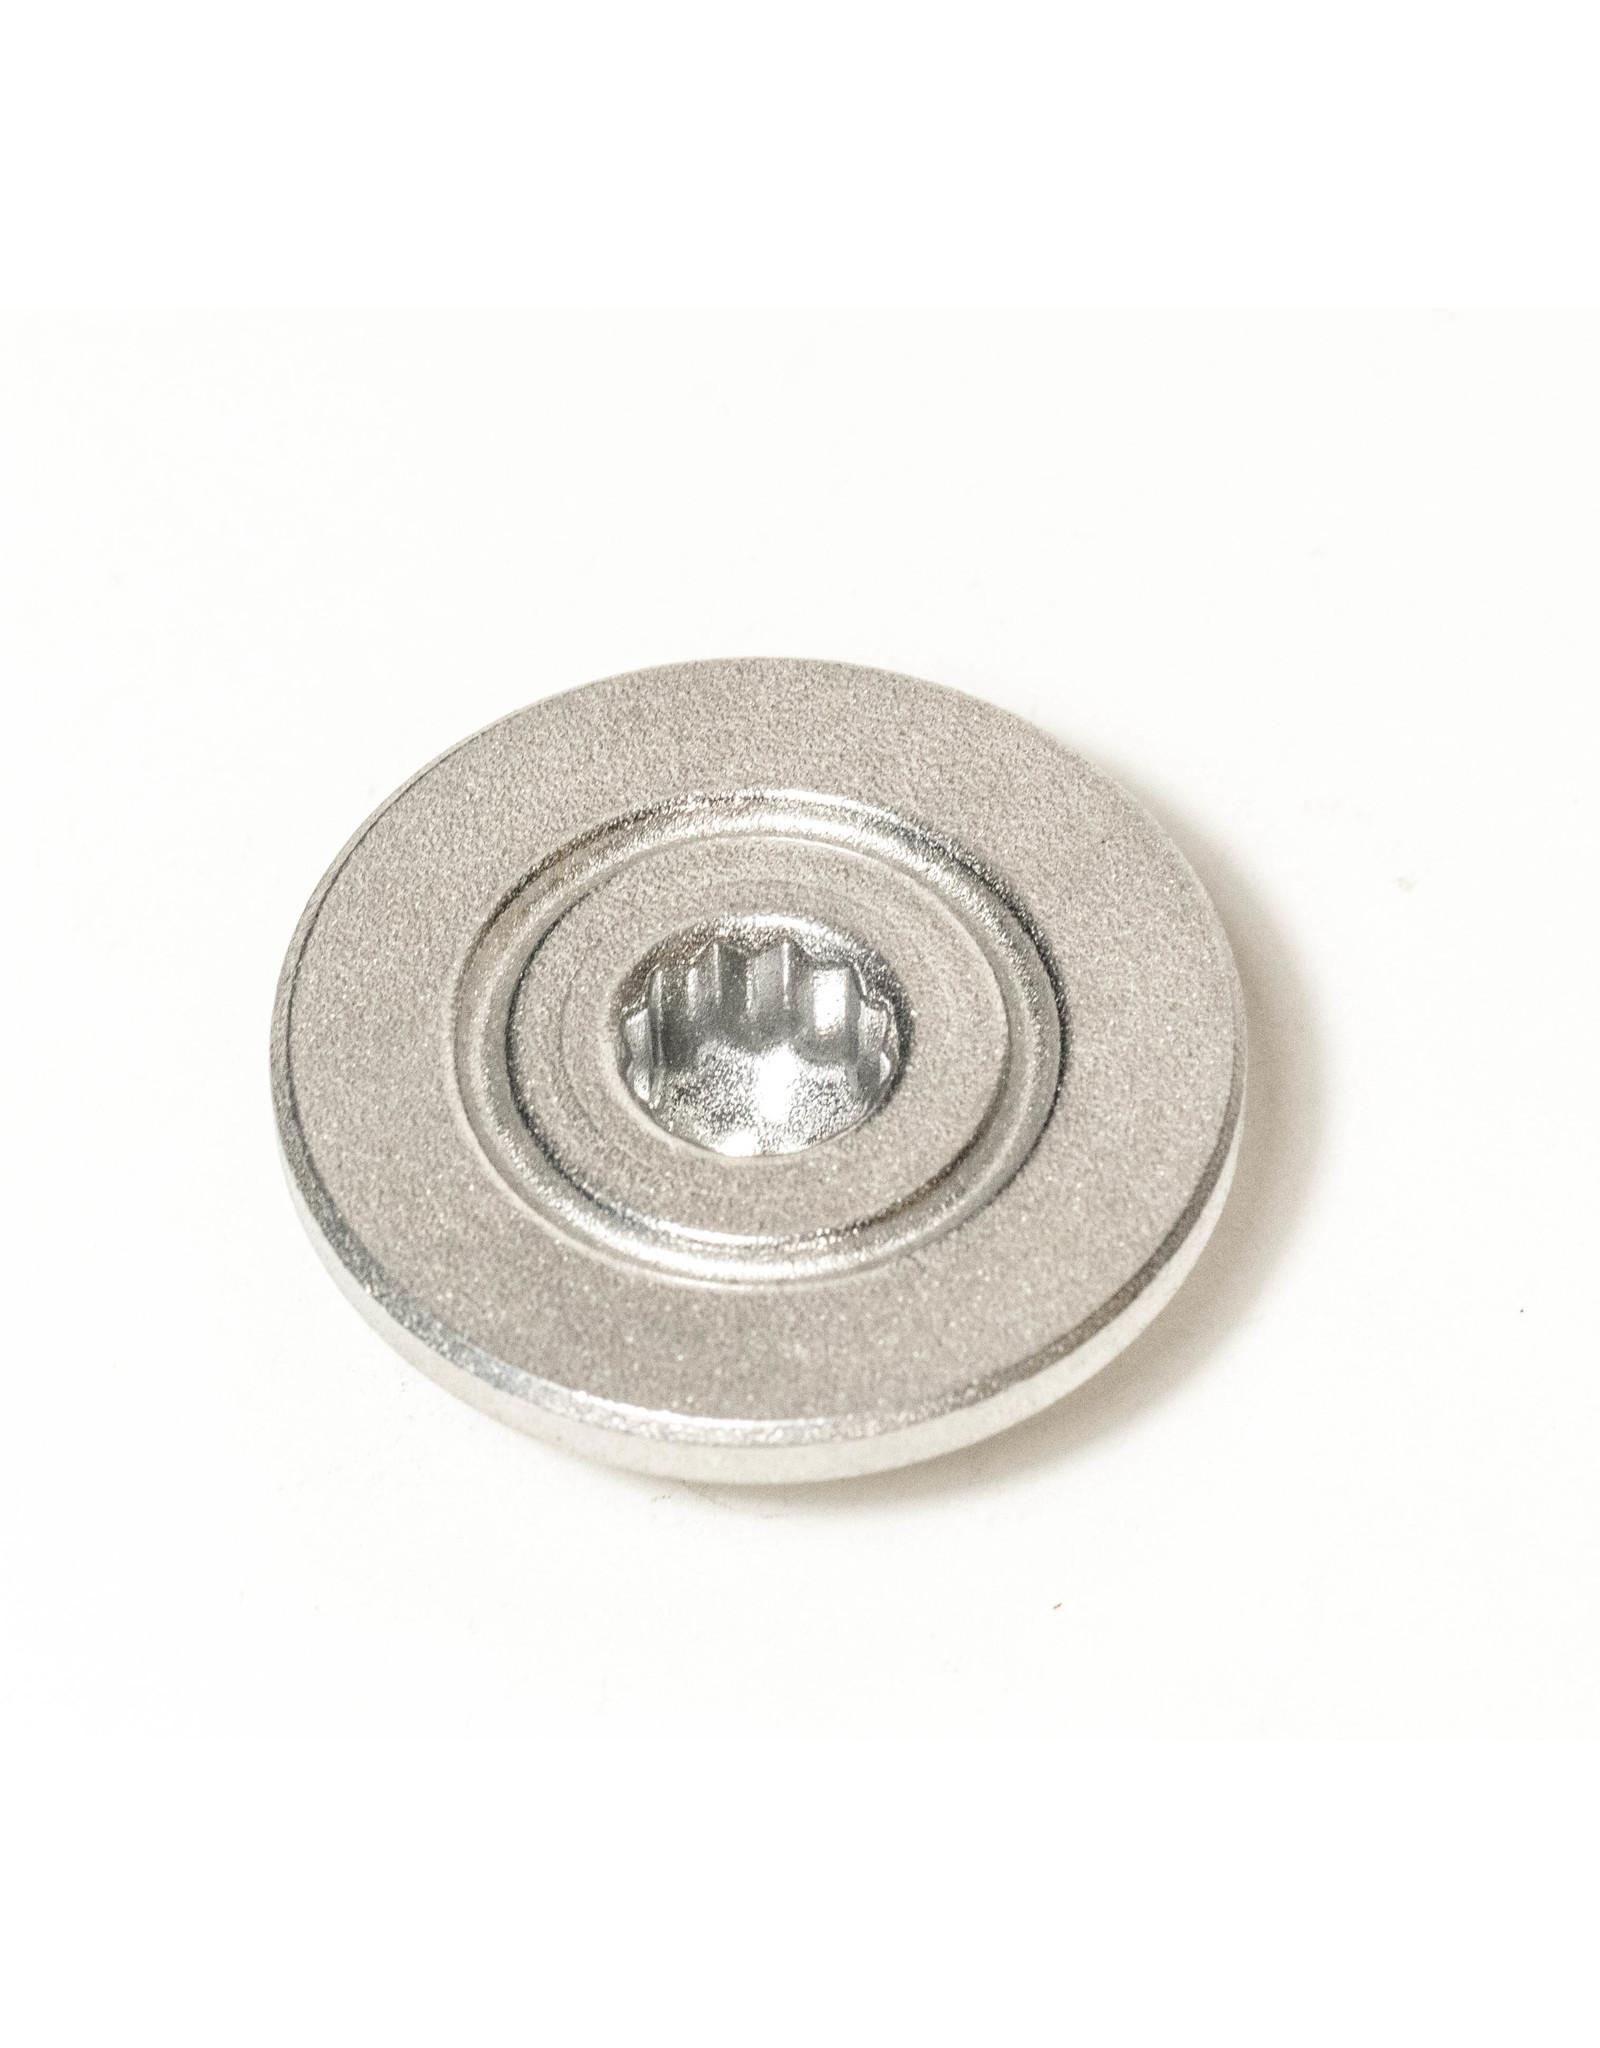 Aprilia Crankcase Plug (v4) 857543